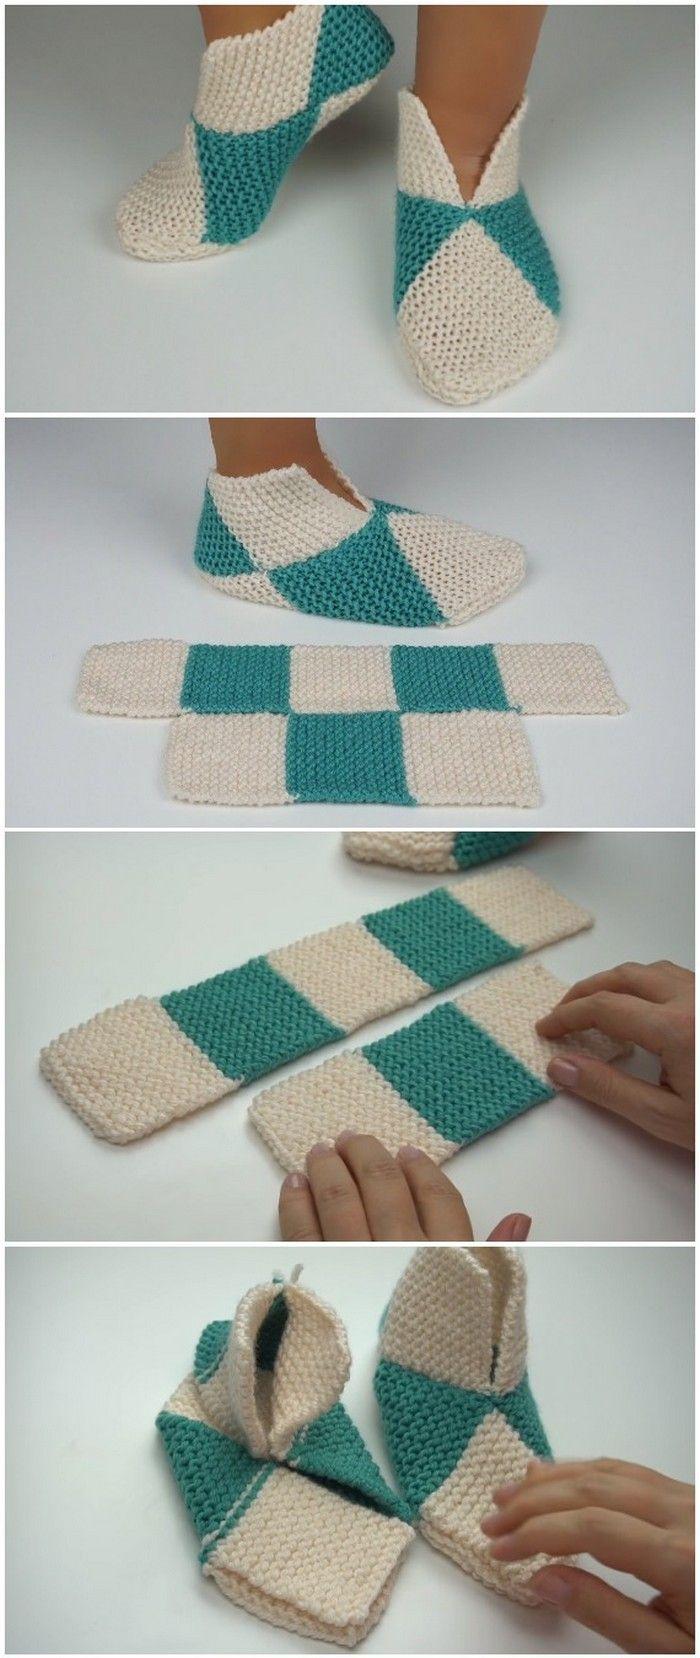 Modern And Latest Crochet Pattern Ideas – Diy & Cr…